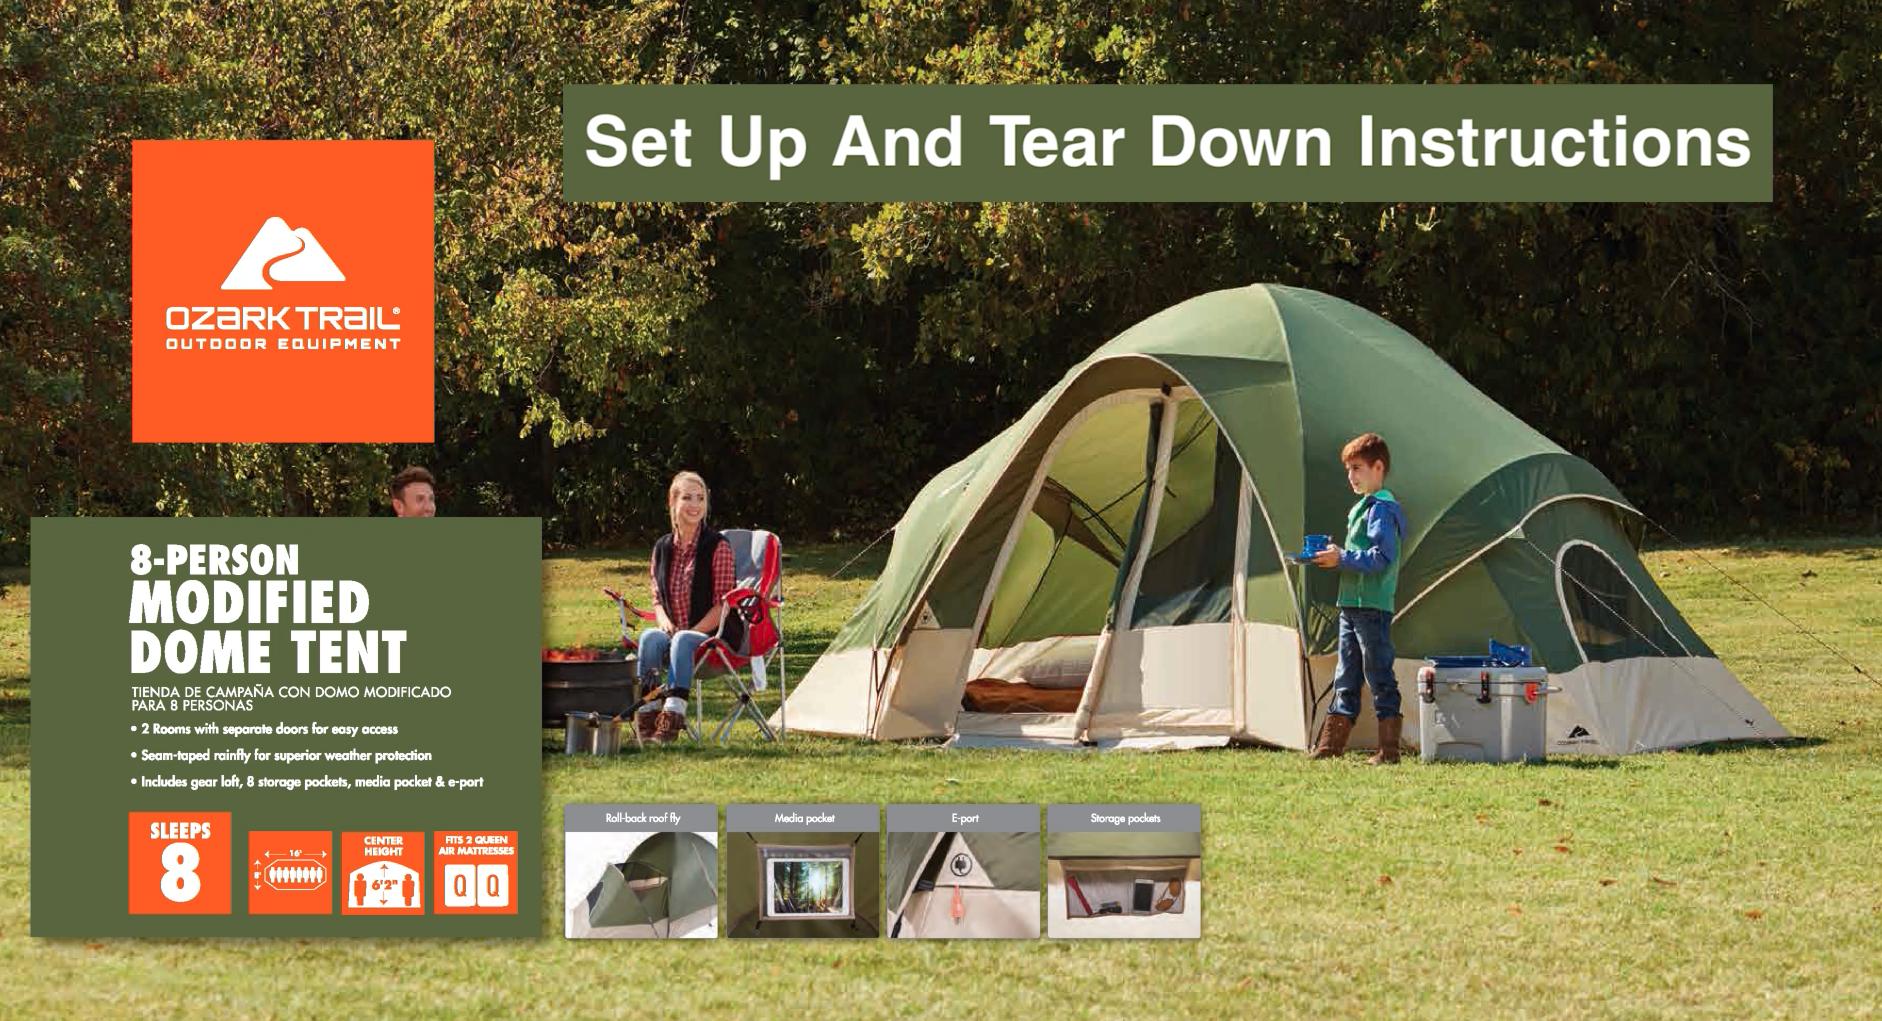 Ozark trail tents instruction manual